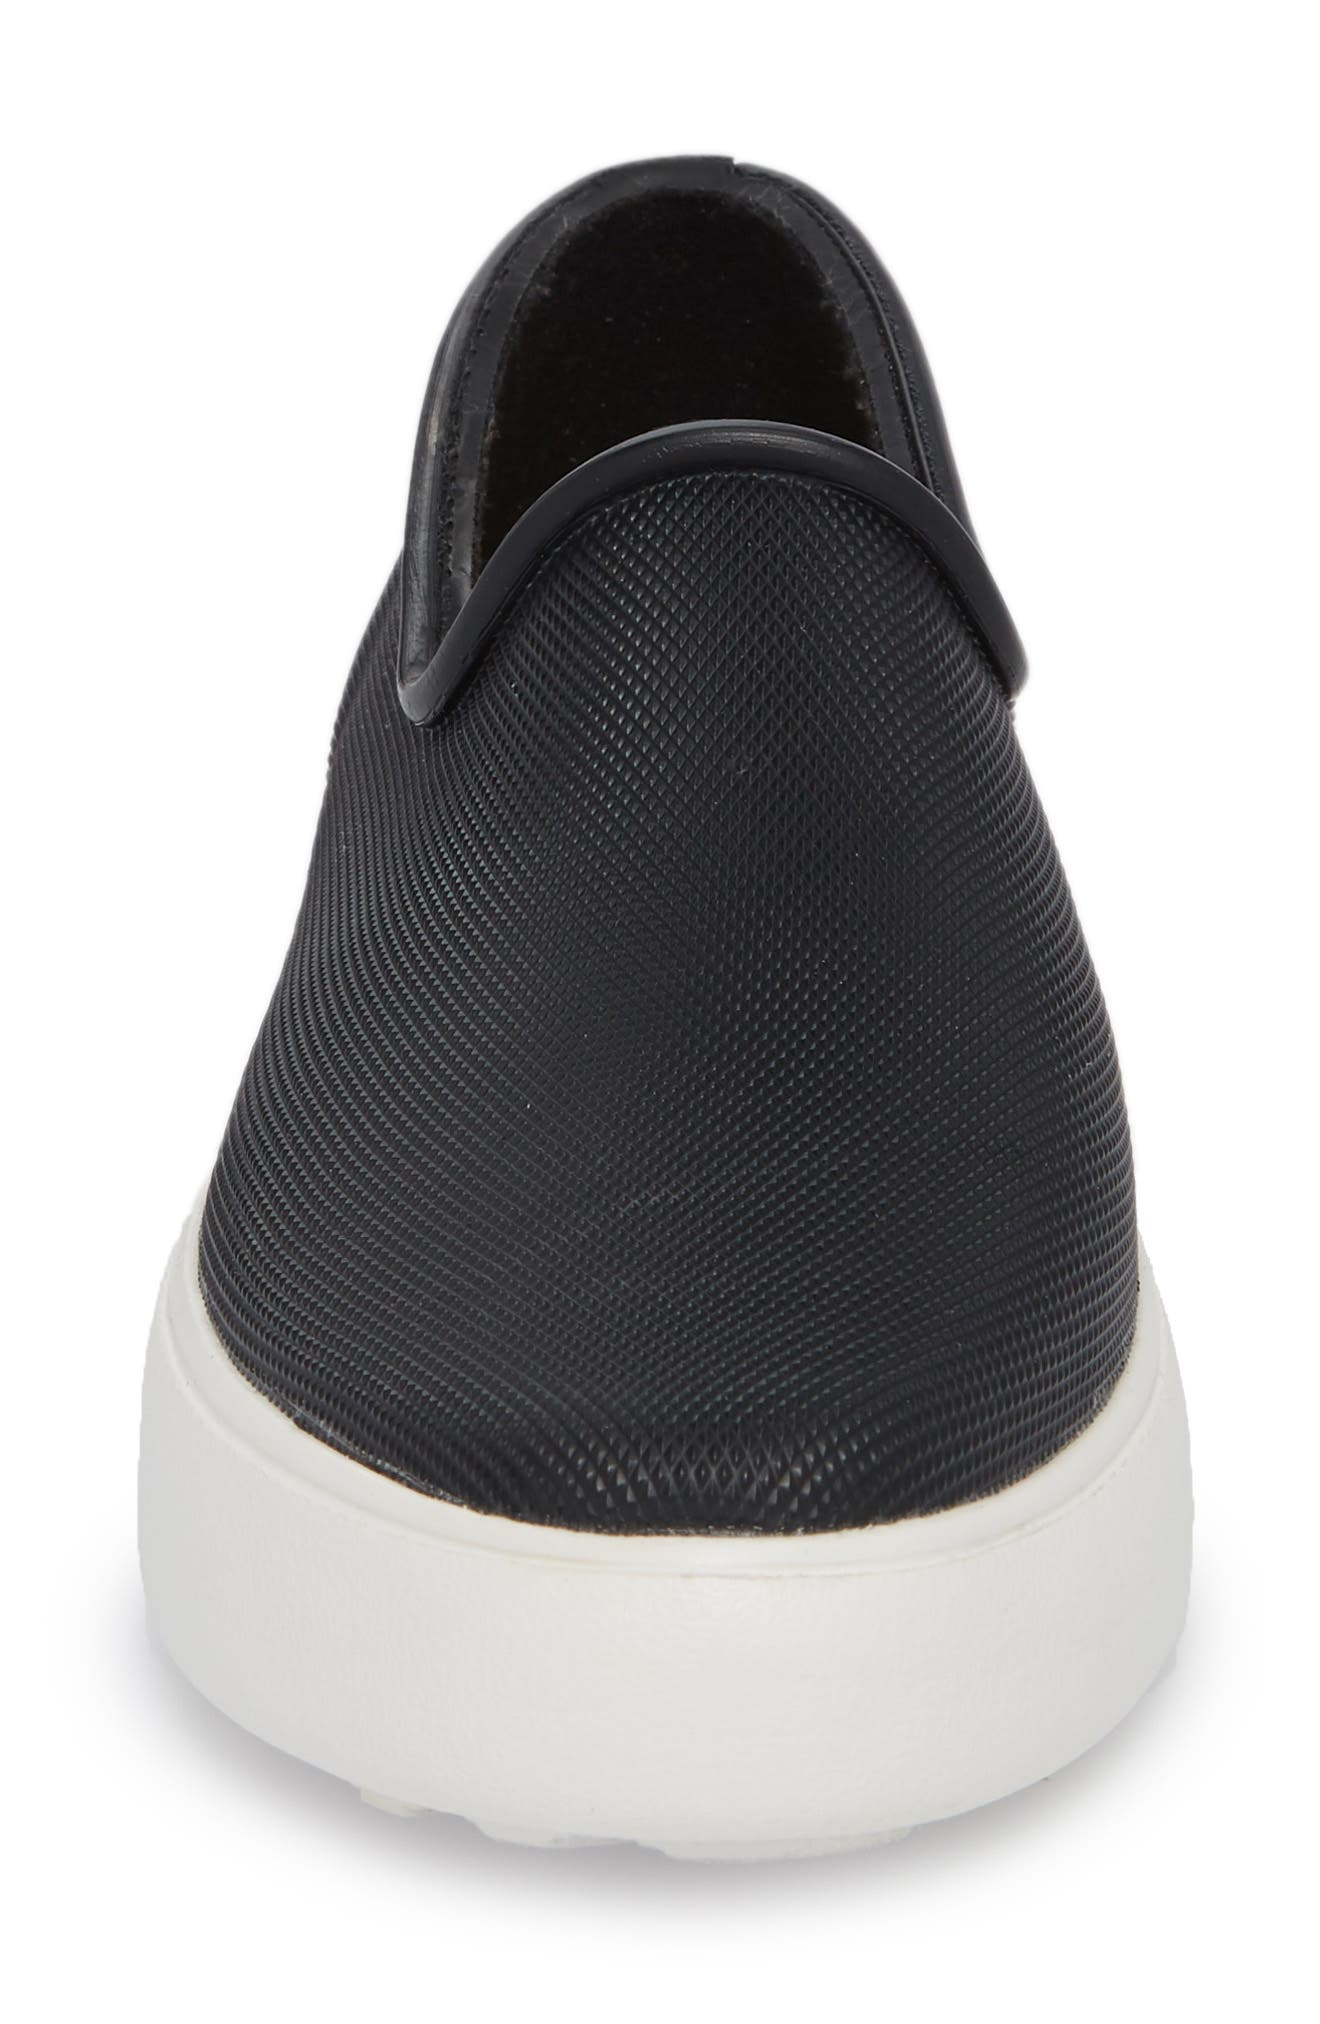 Rainy Day Waterproof Slip-On Sneaker,                             Alternate thumbnail 4, color,                             001